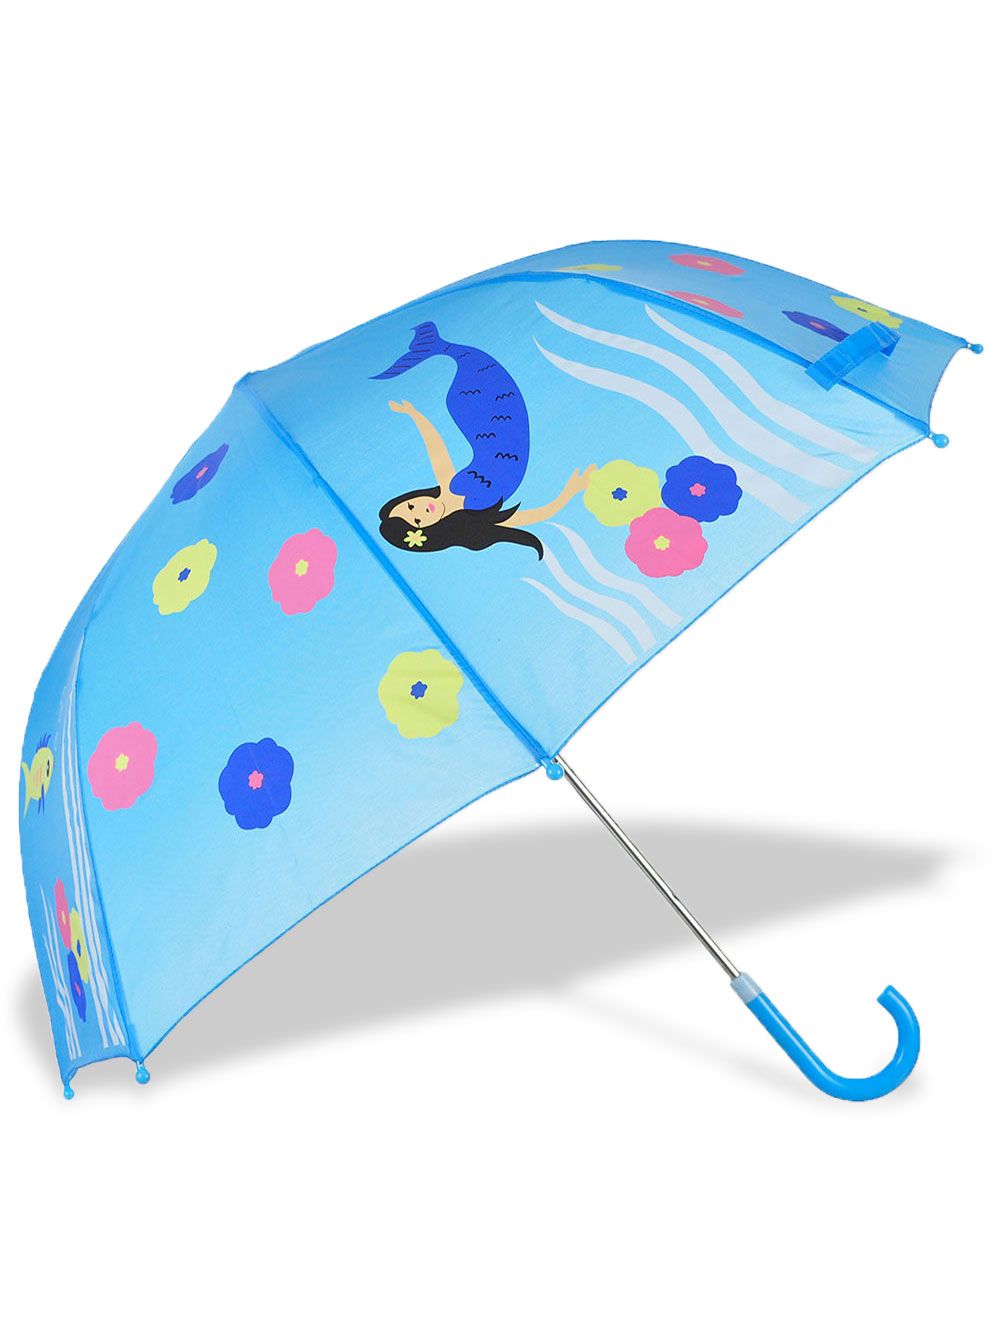 Lilly New York Umbrella